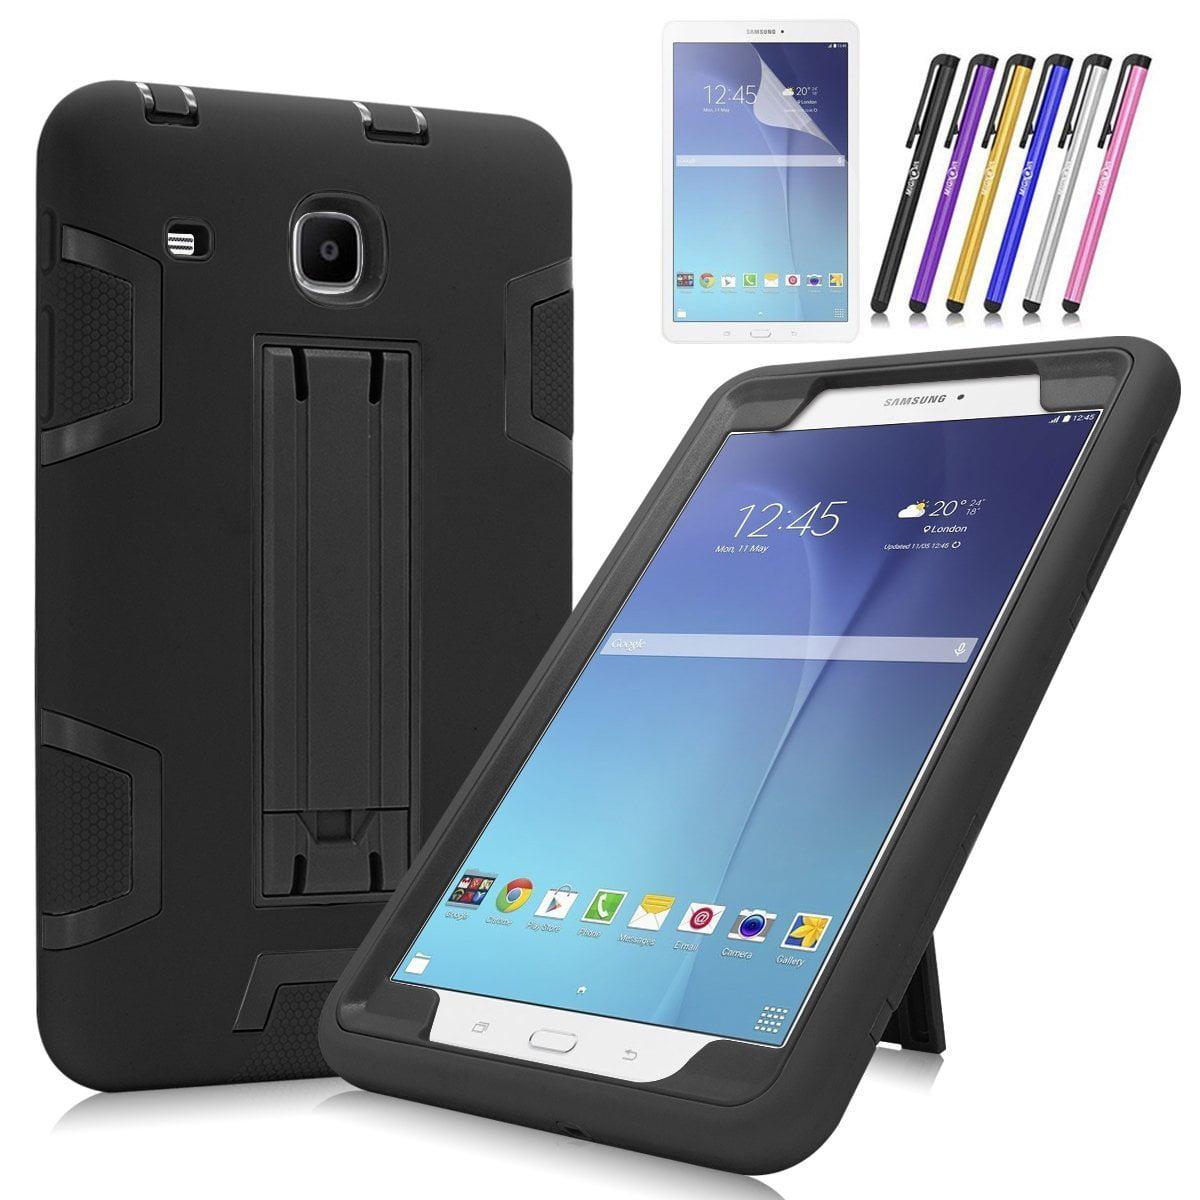 Mignova Galaxy Tab E 8.0 Case, Heavy Duty Hybrid Protective Case with Build In Kickstand For Samsung Galaxy Tab E 8.0 Inch SM-T377 T375 T378 + Screen Protector Film and Stylus Pen (Black / Black)